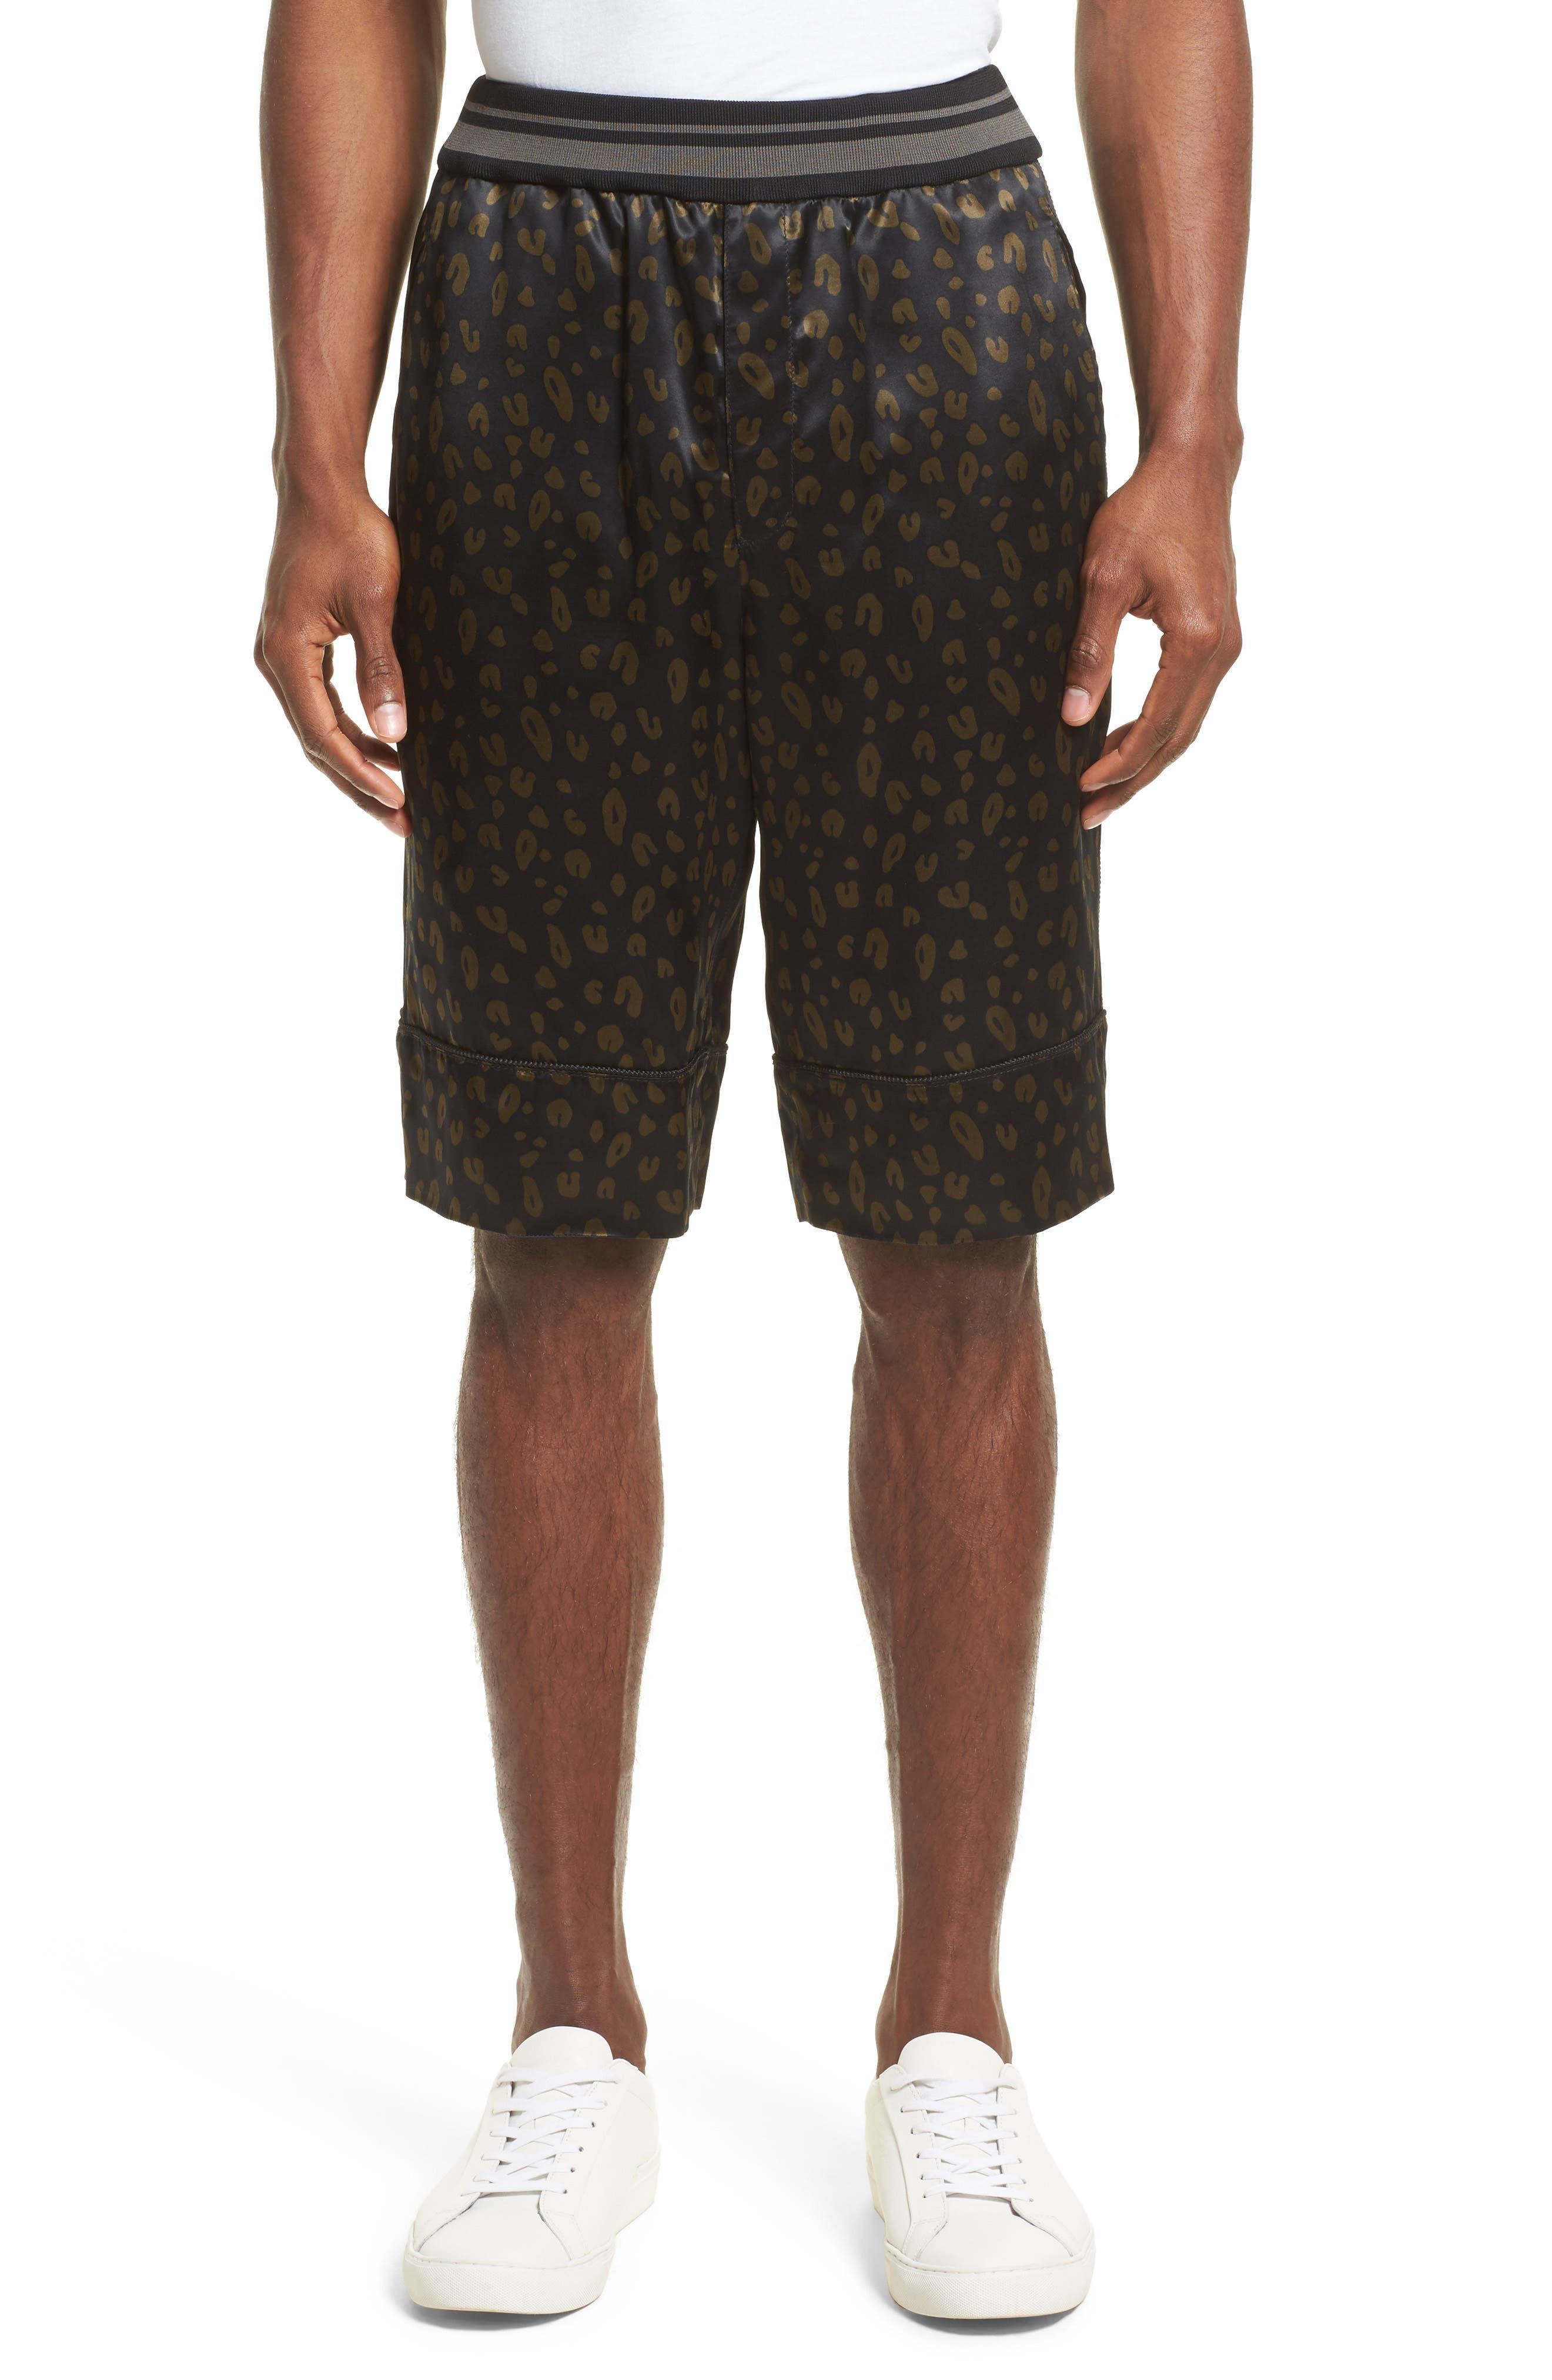 3.1 Phillip Lim Reversible Elastic Waist Shorts